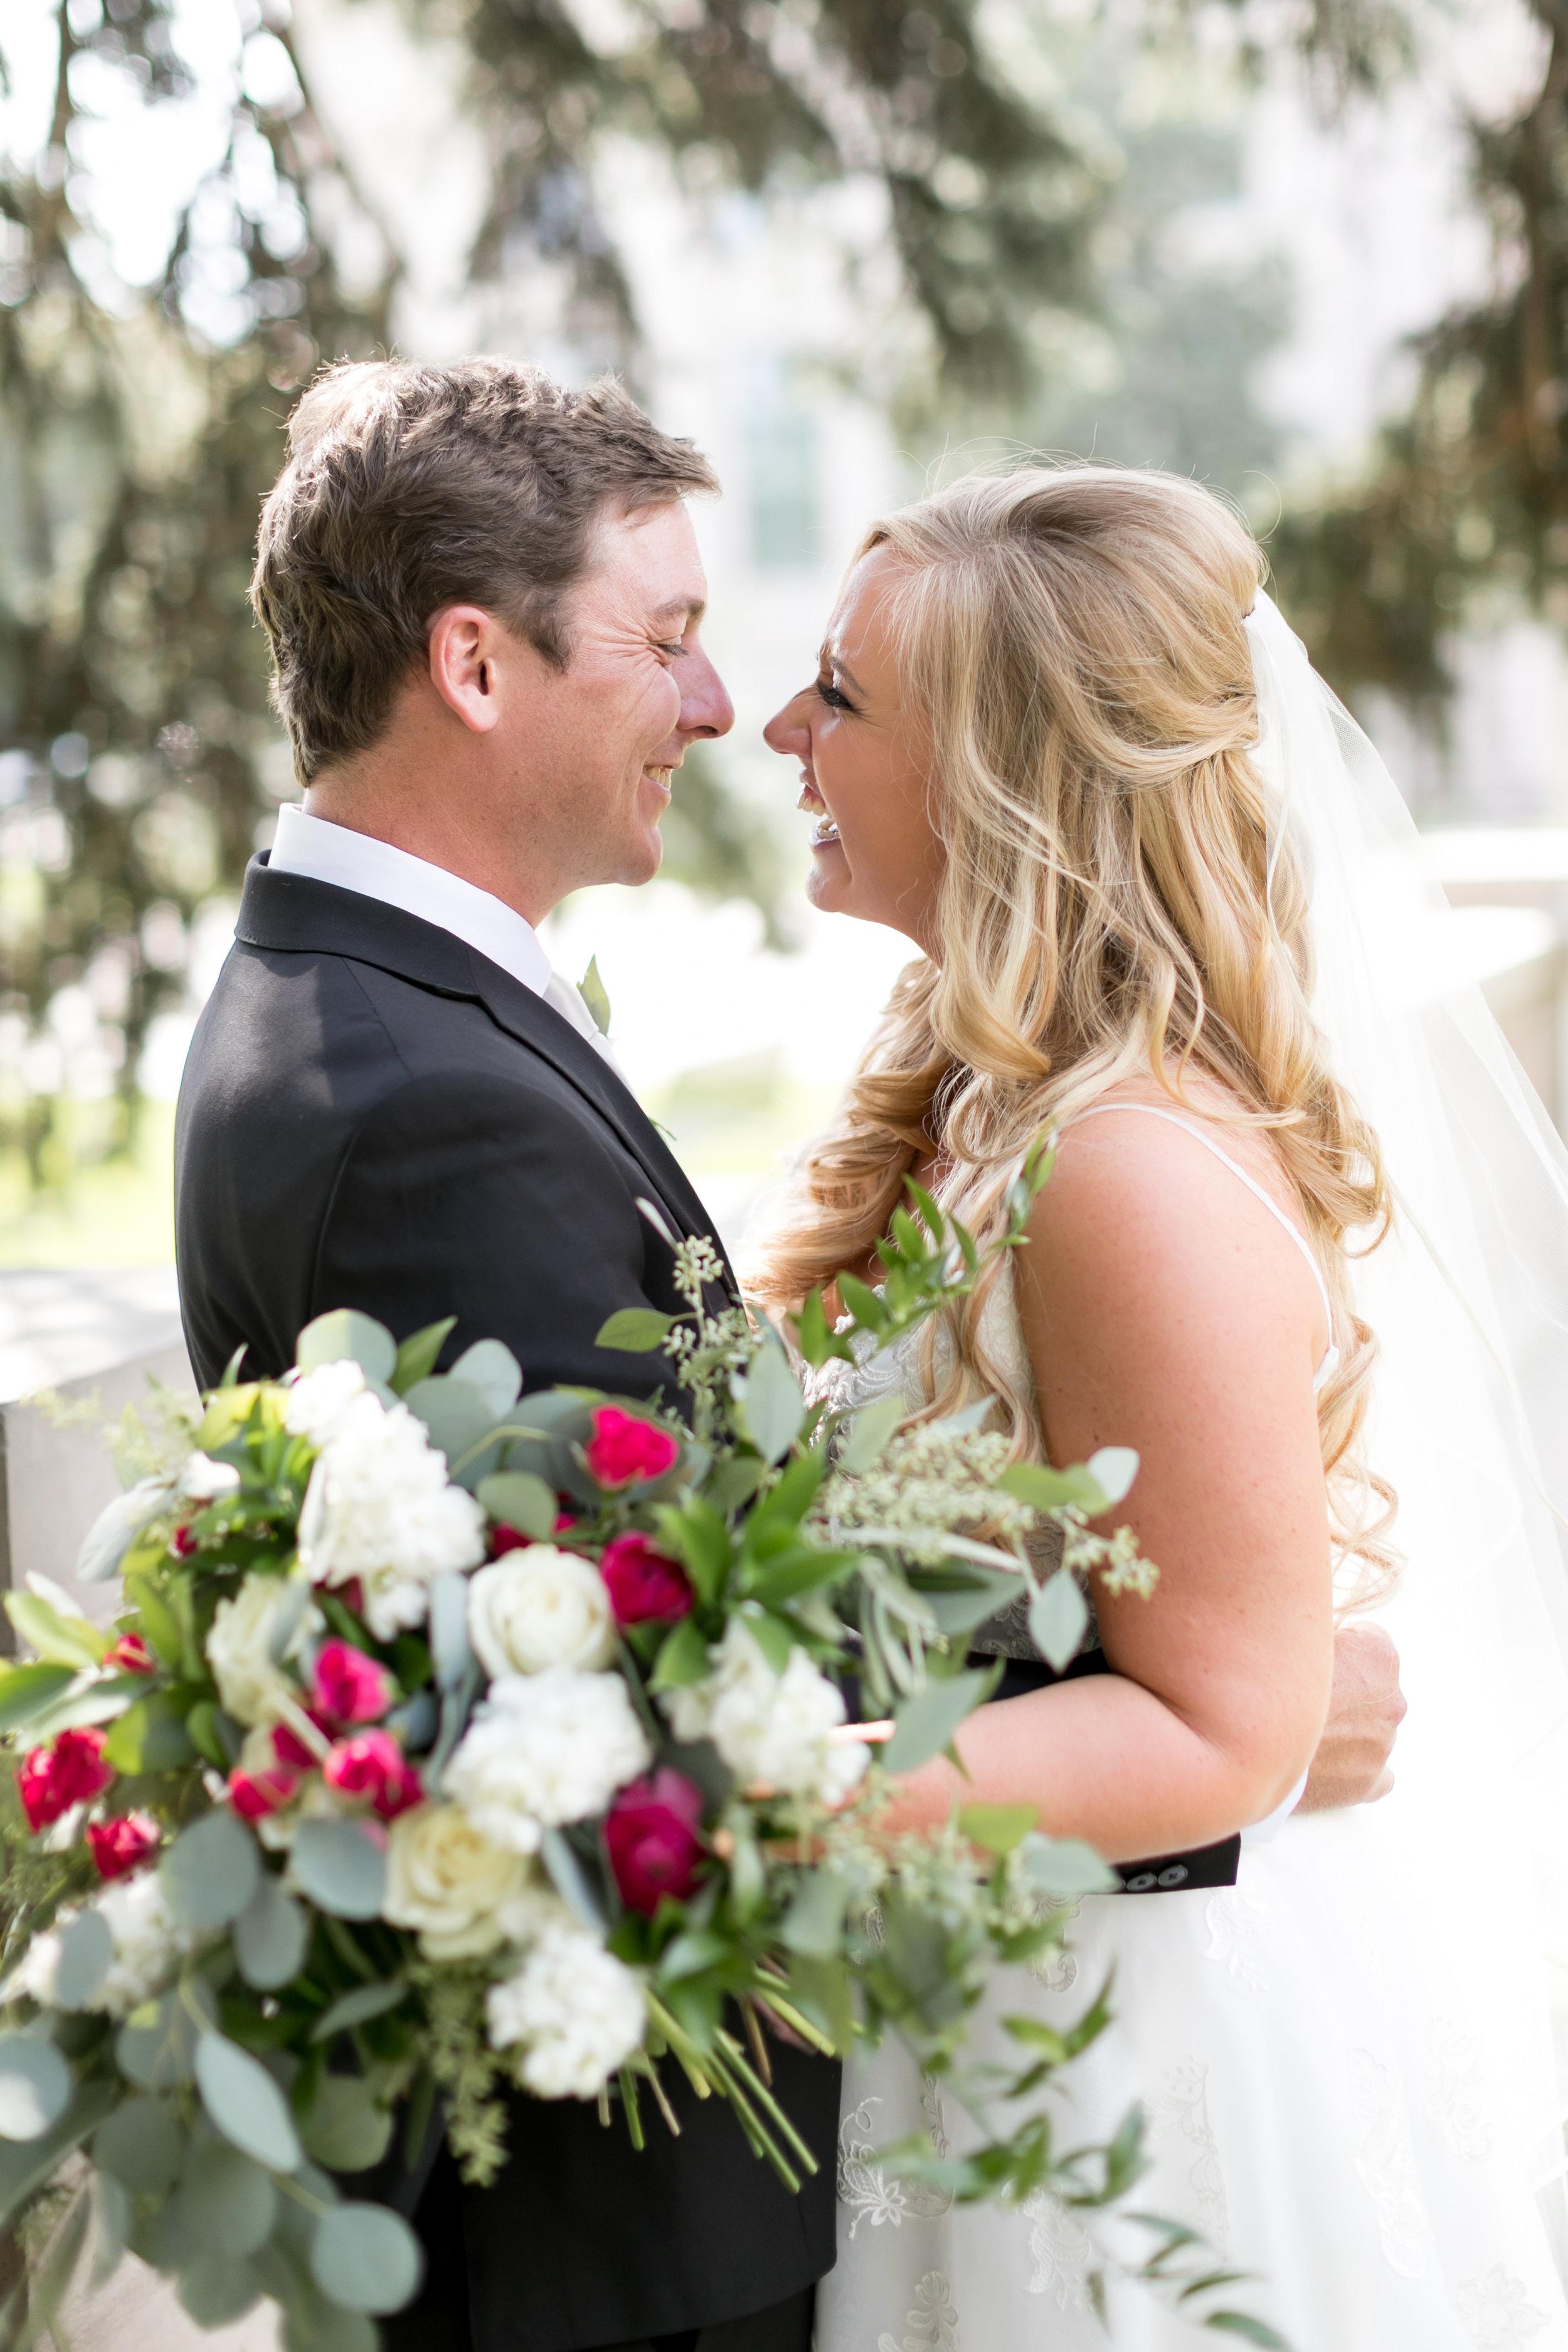 city-chic-downtown-denver-park-wedding20.jpg